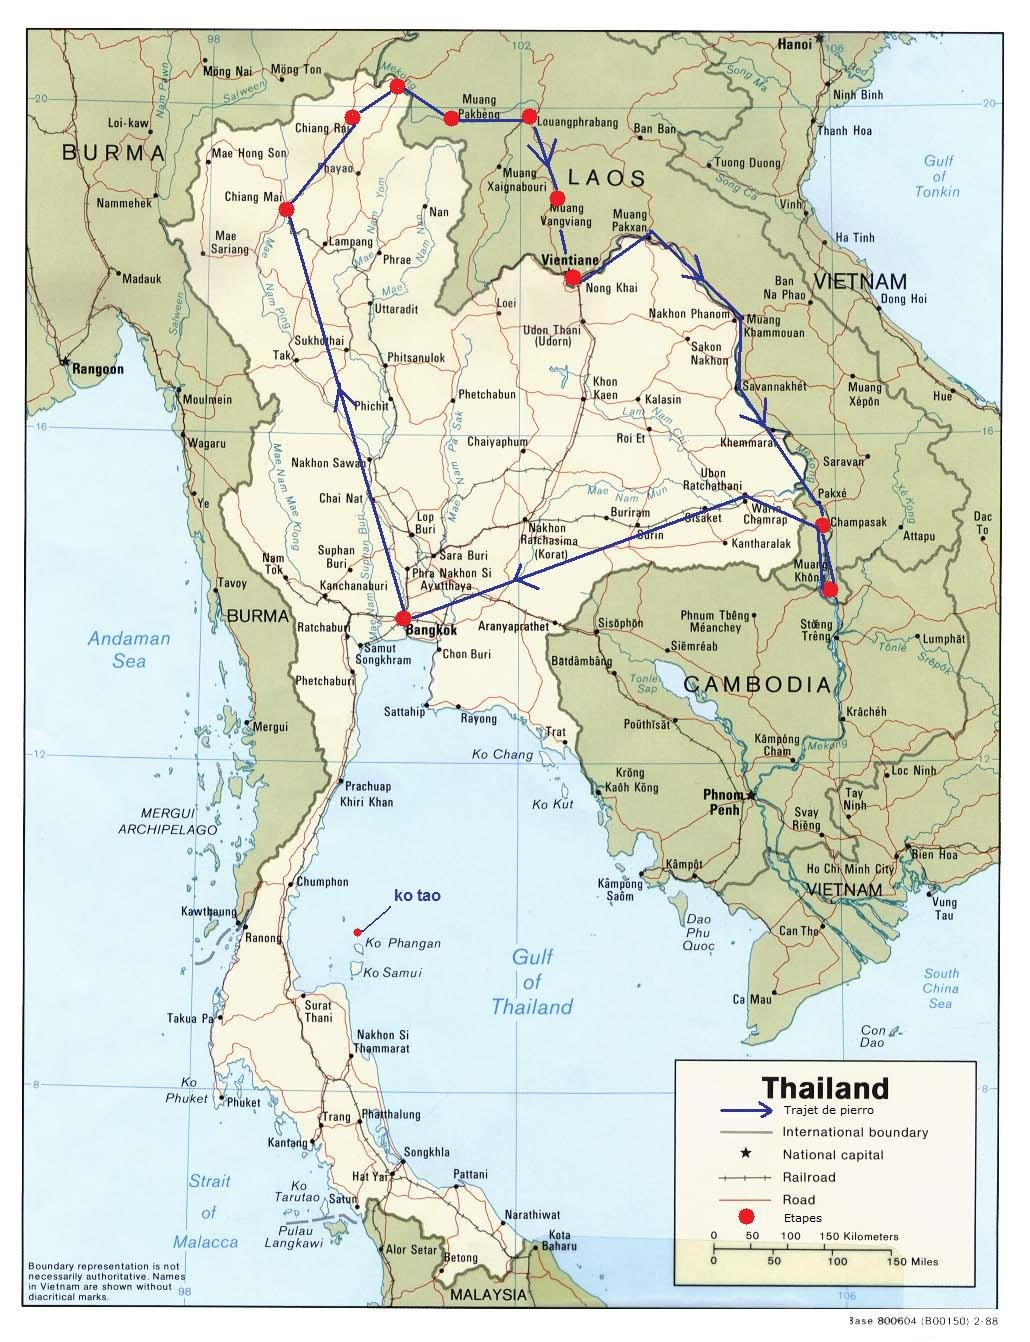 carte-thailande-laos-vietnam